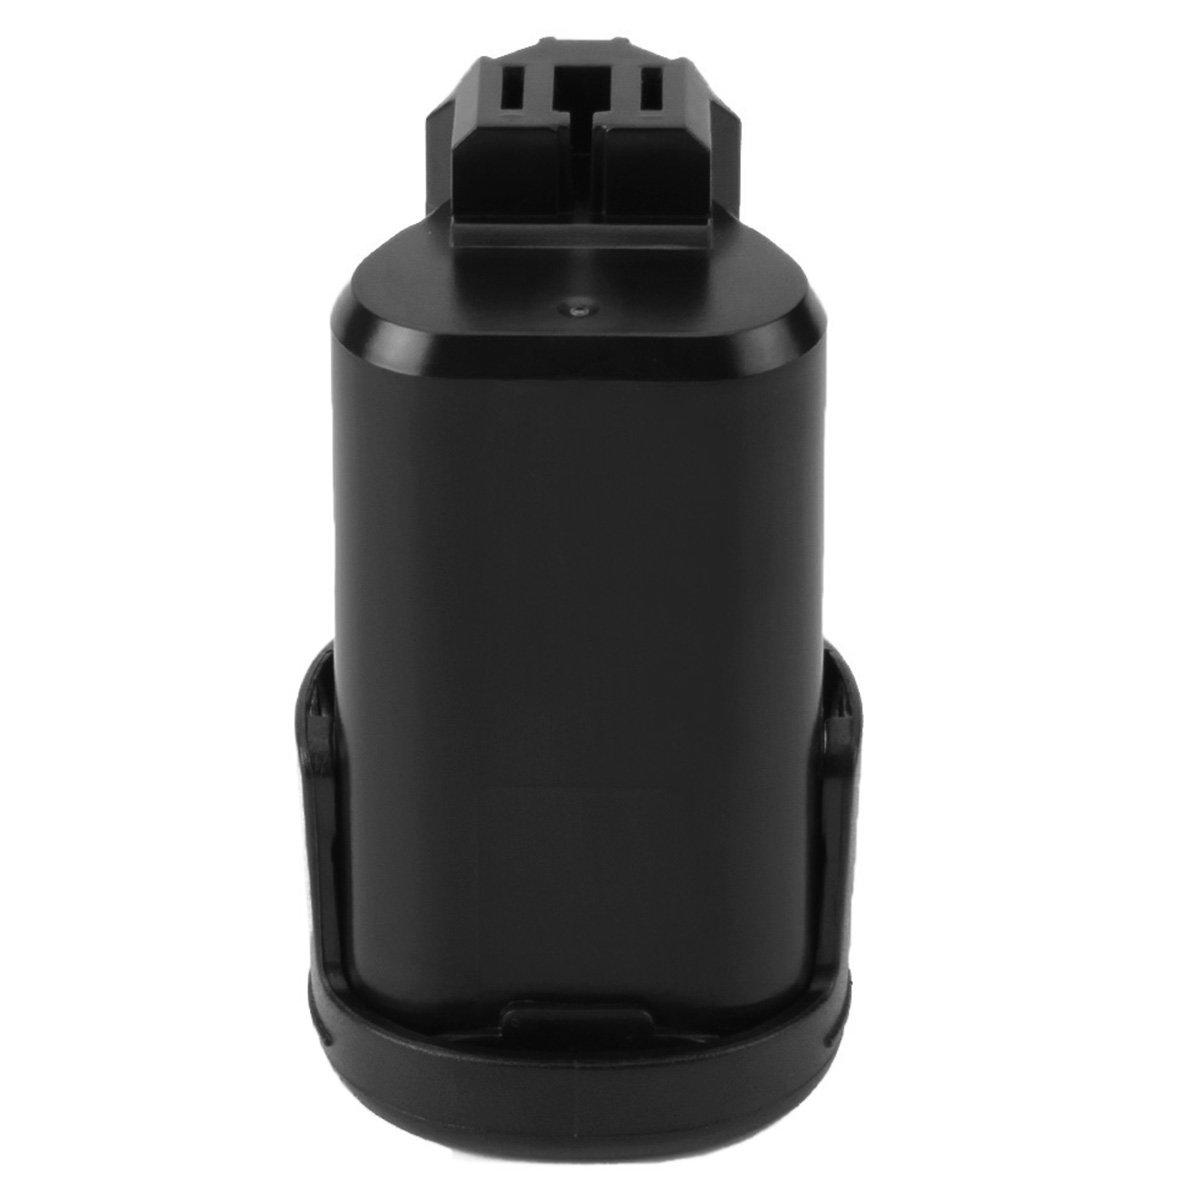 Exmate 12V 3.0Ah Li-ion Replacement Battery for Dremel 8200 8220 8300 Replace Dremel B812-02